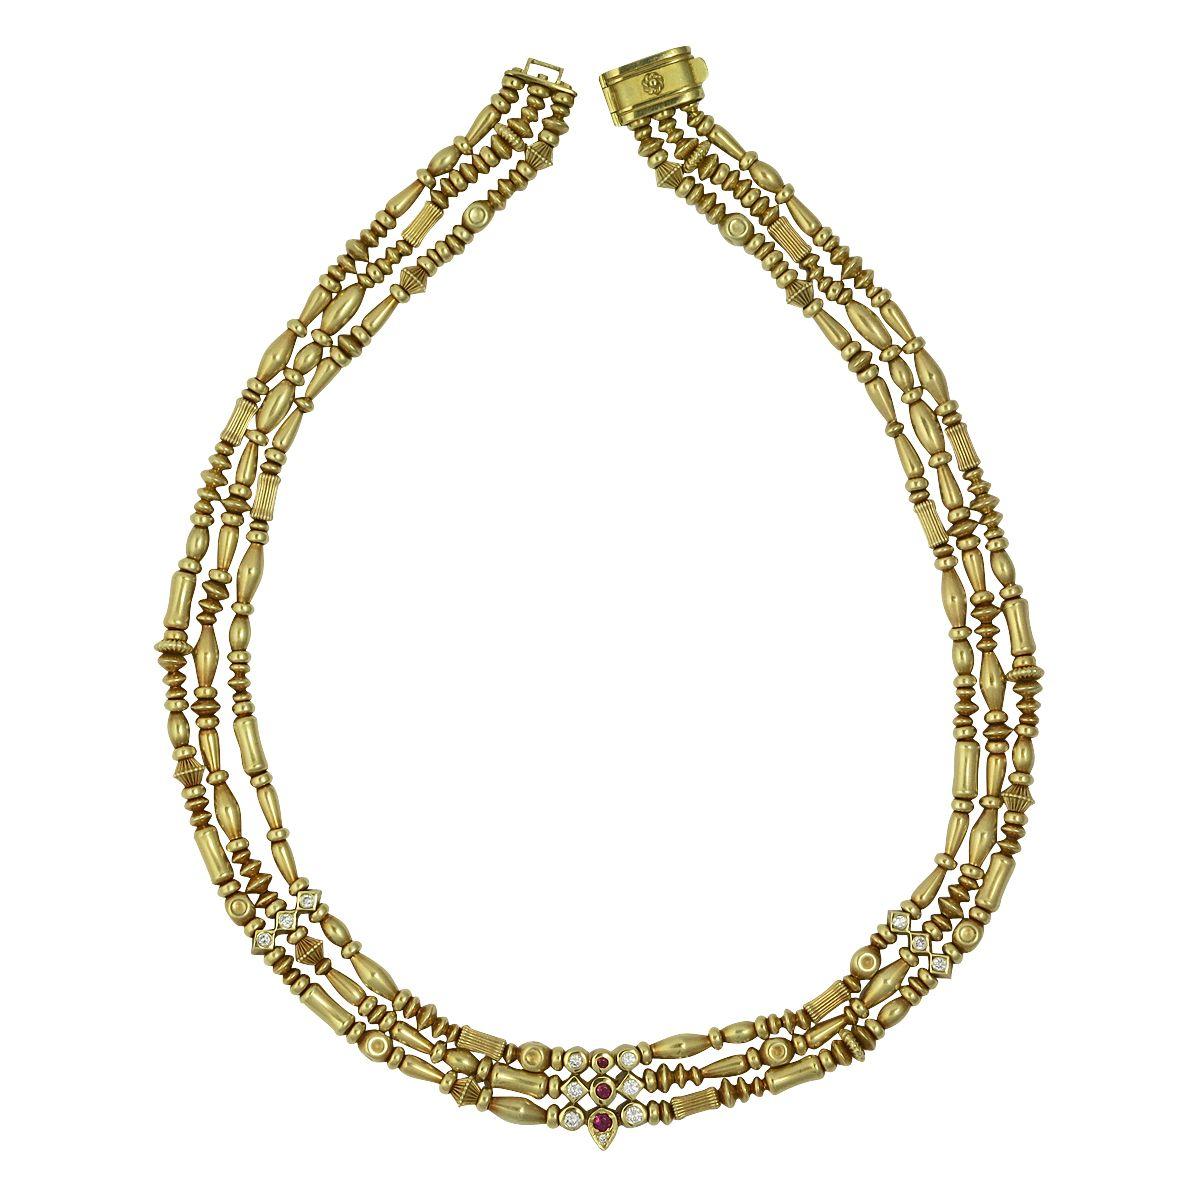 18K Gold 3 Strand Diamond & Ruby Seidengang Necklace, c. 2000. $9500